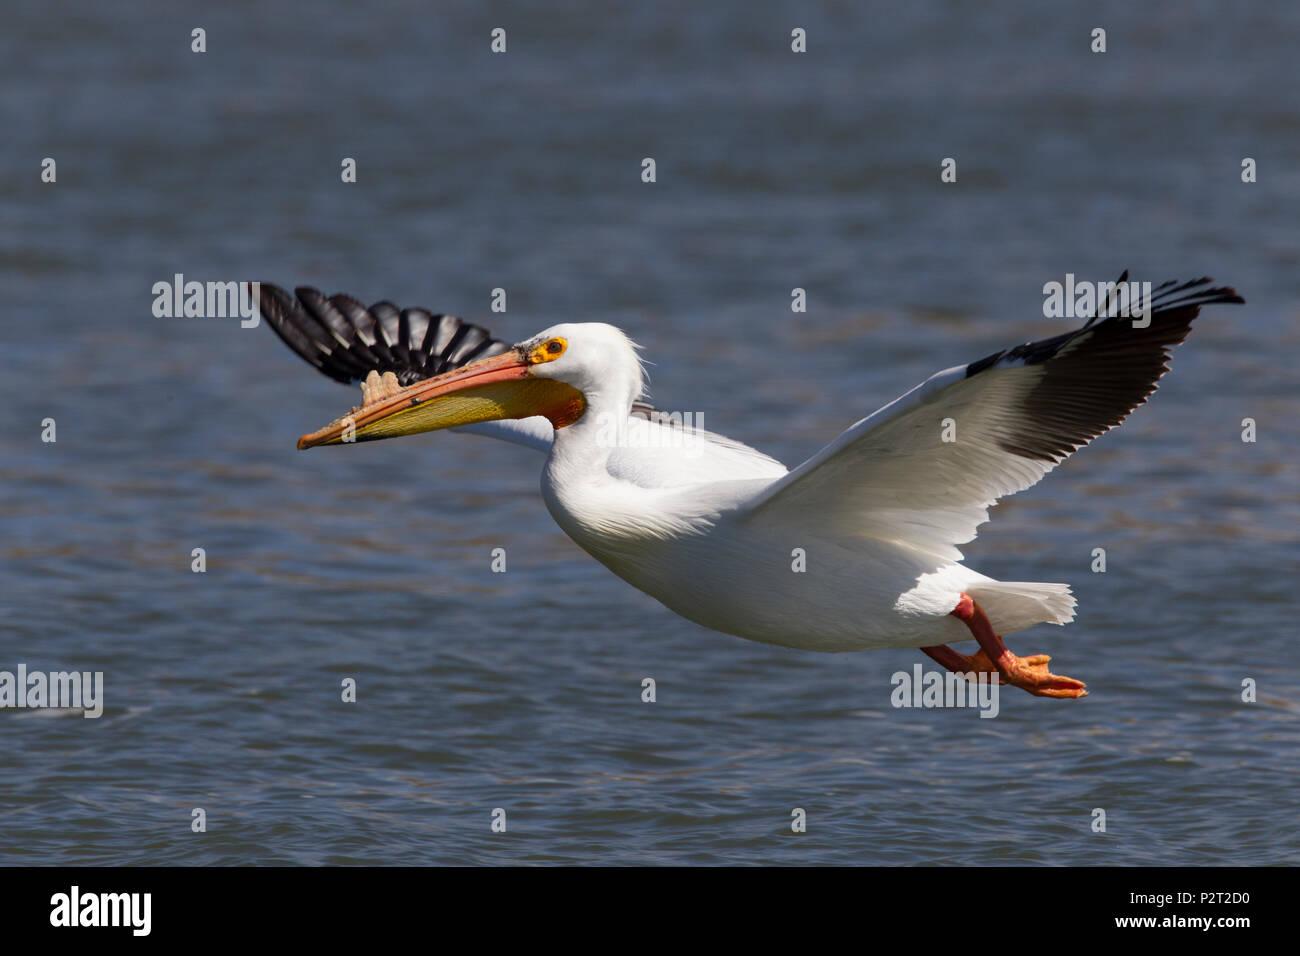 American white pelican (Pelecanus erythrorhyncos) slows its flight in preparation for landing. - Stock Image